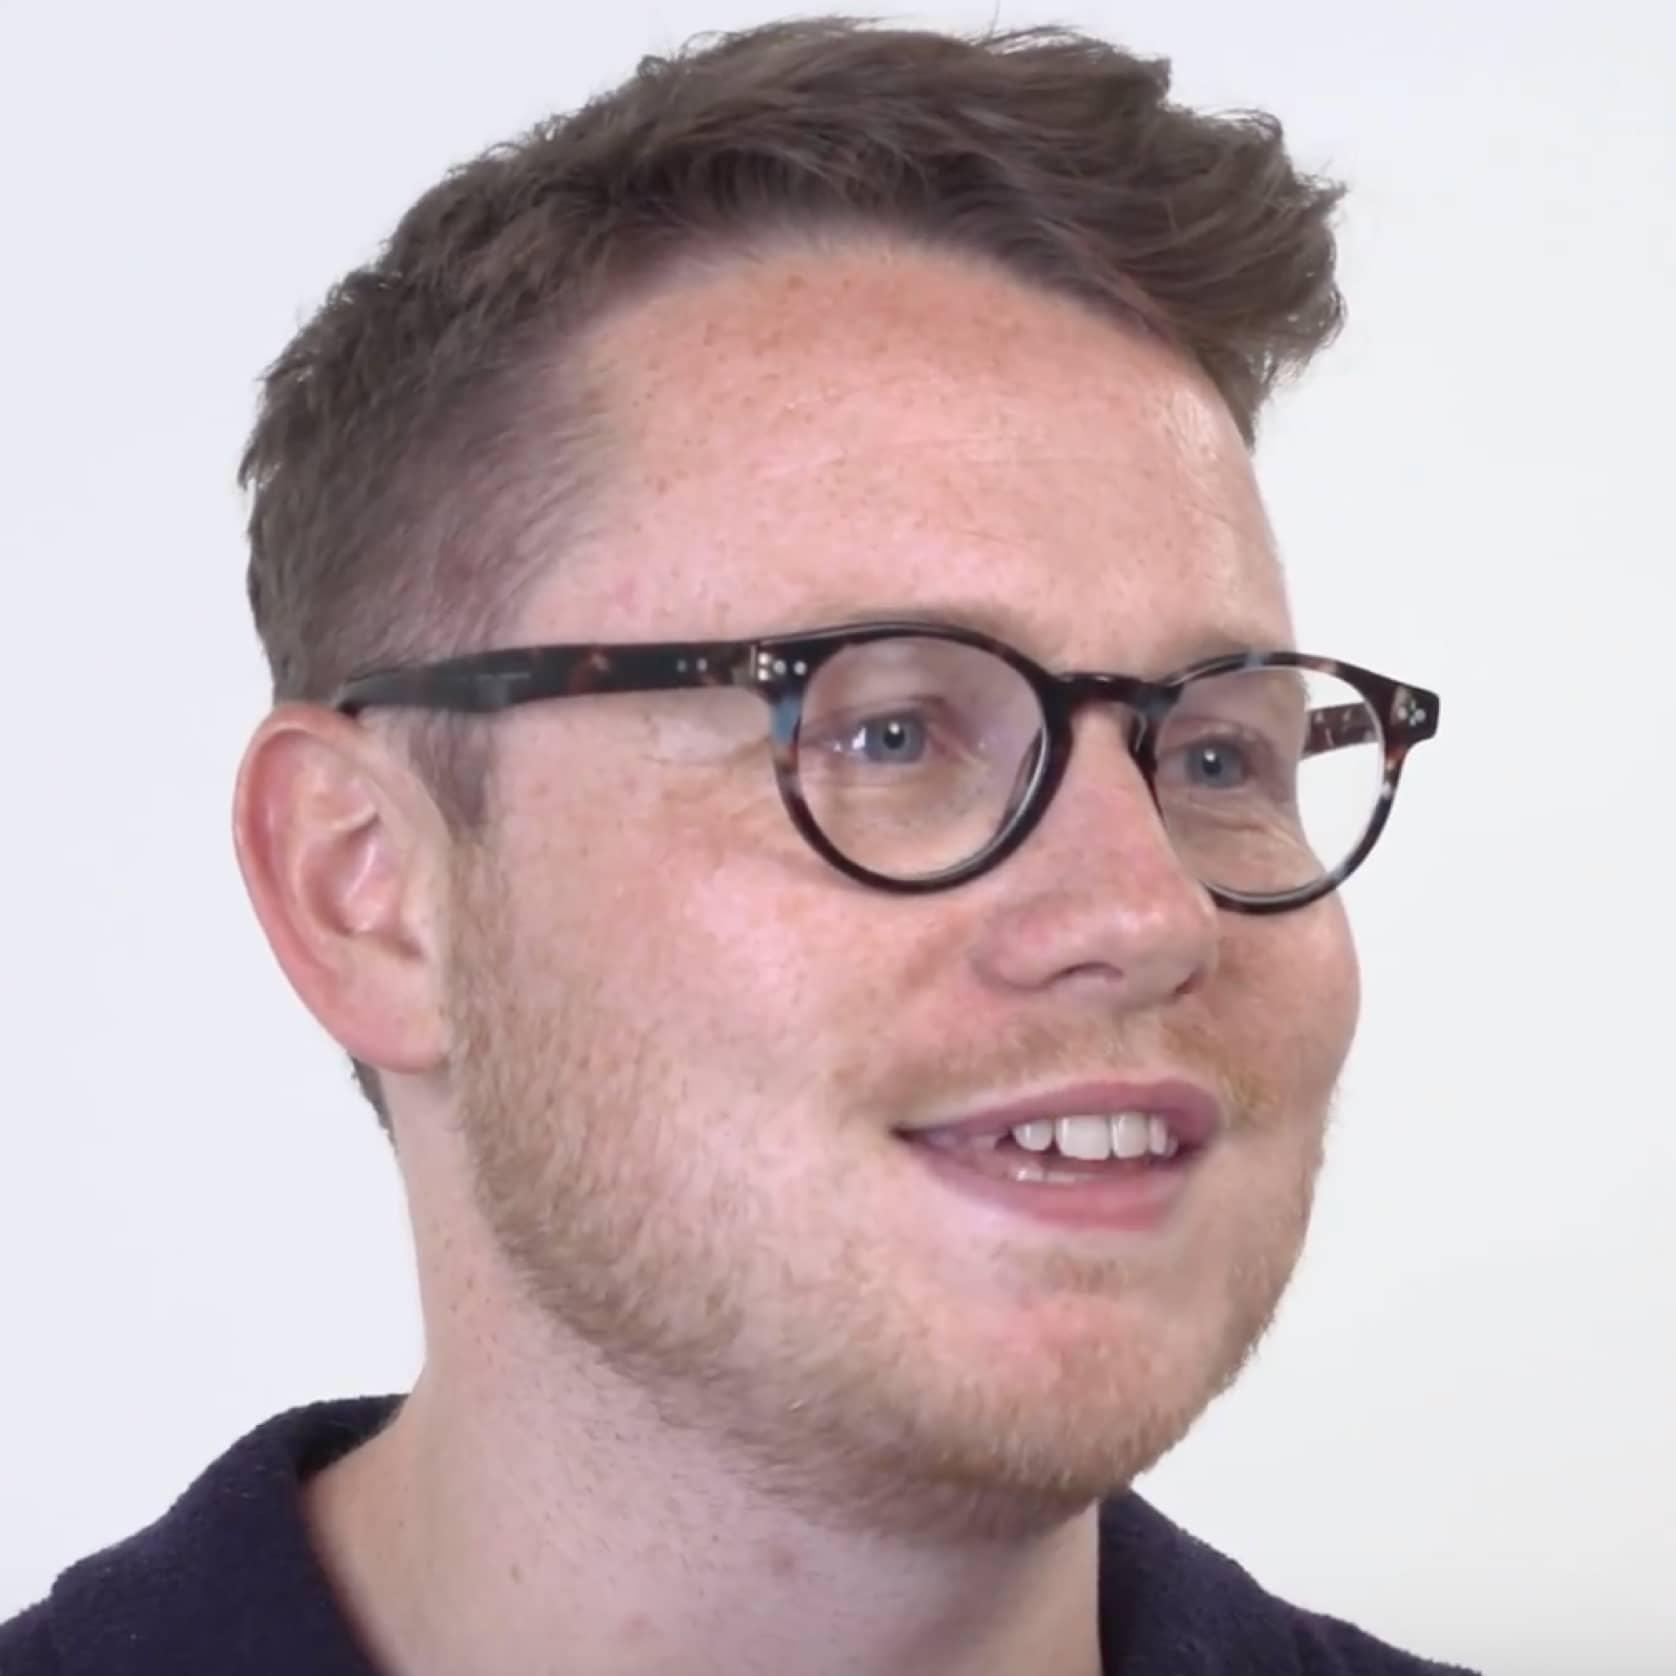 Ian Mackey, Director of Content Strategy and Performance Marketing at Hearst UK headshot